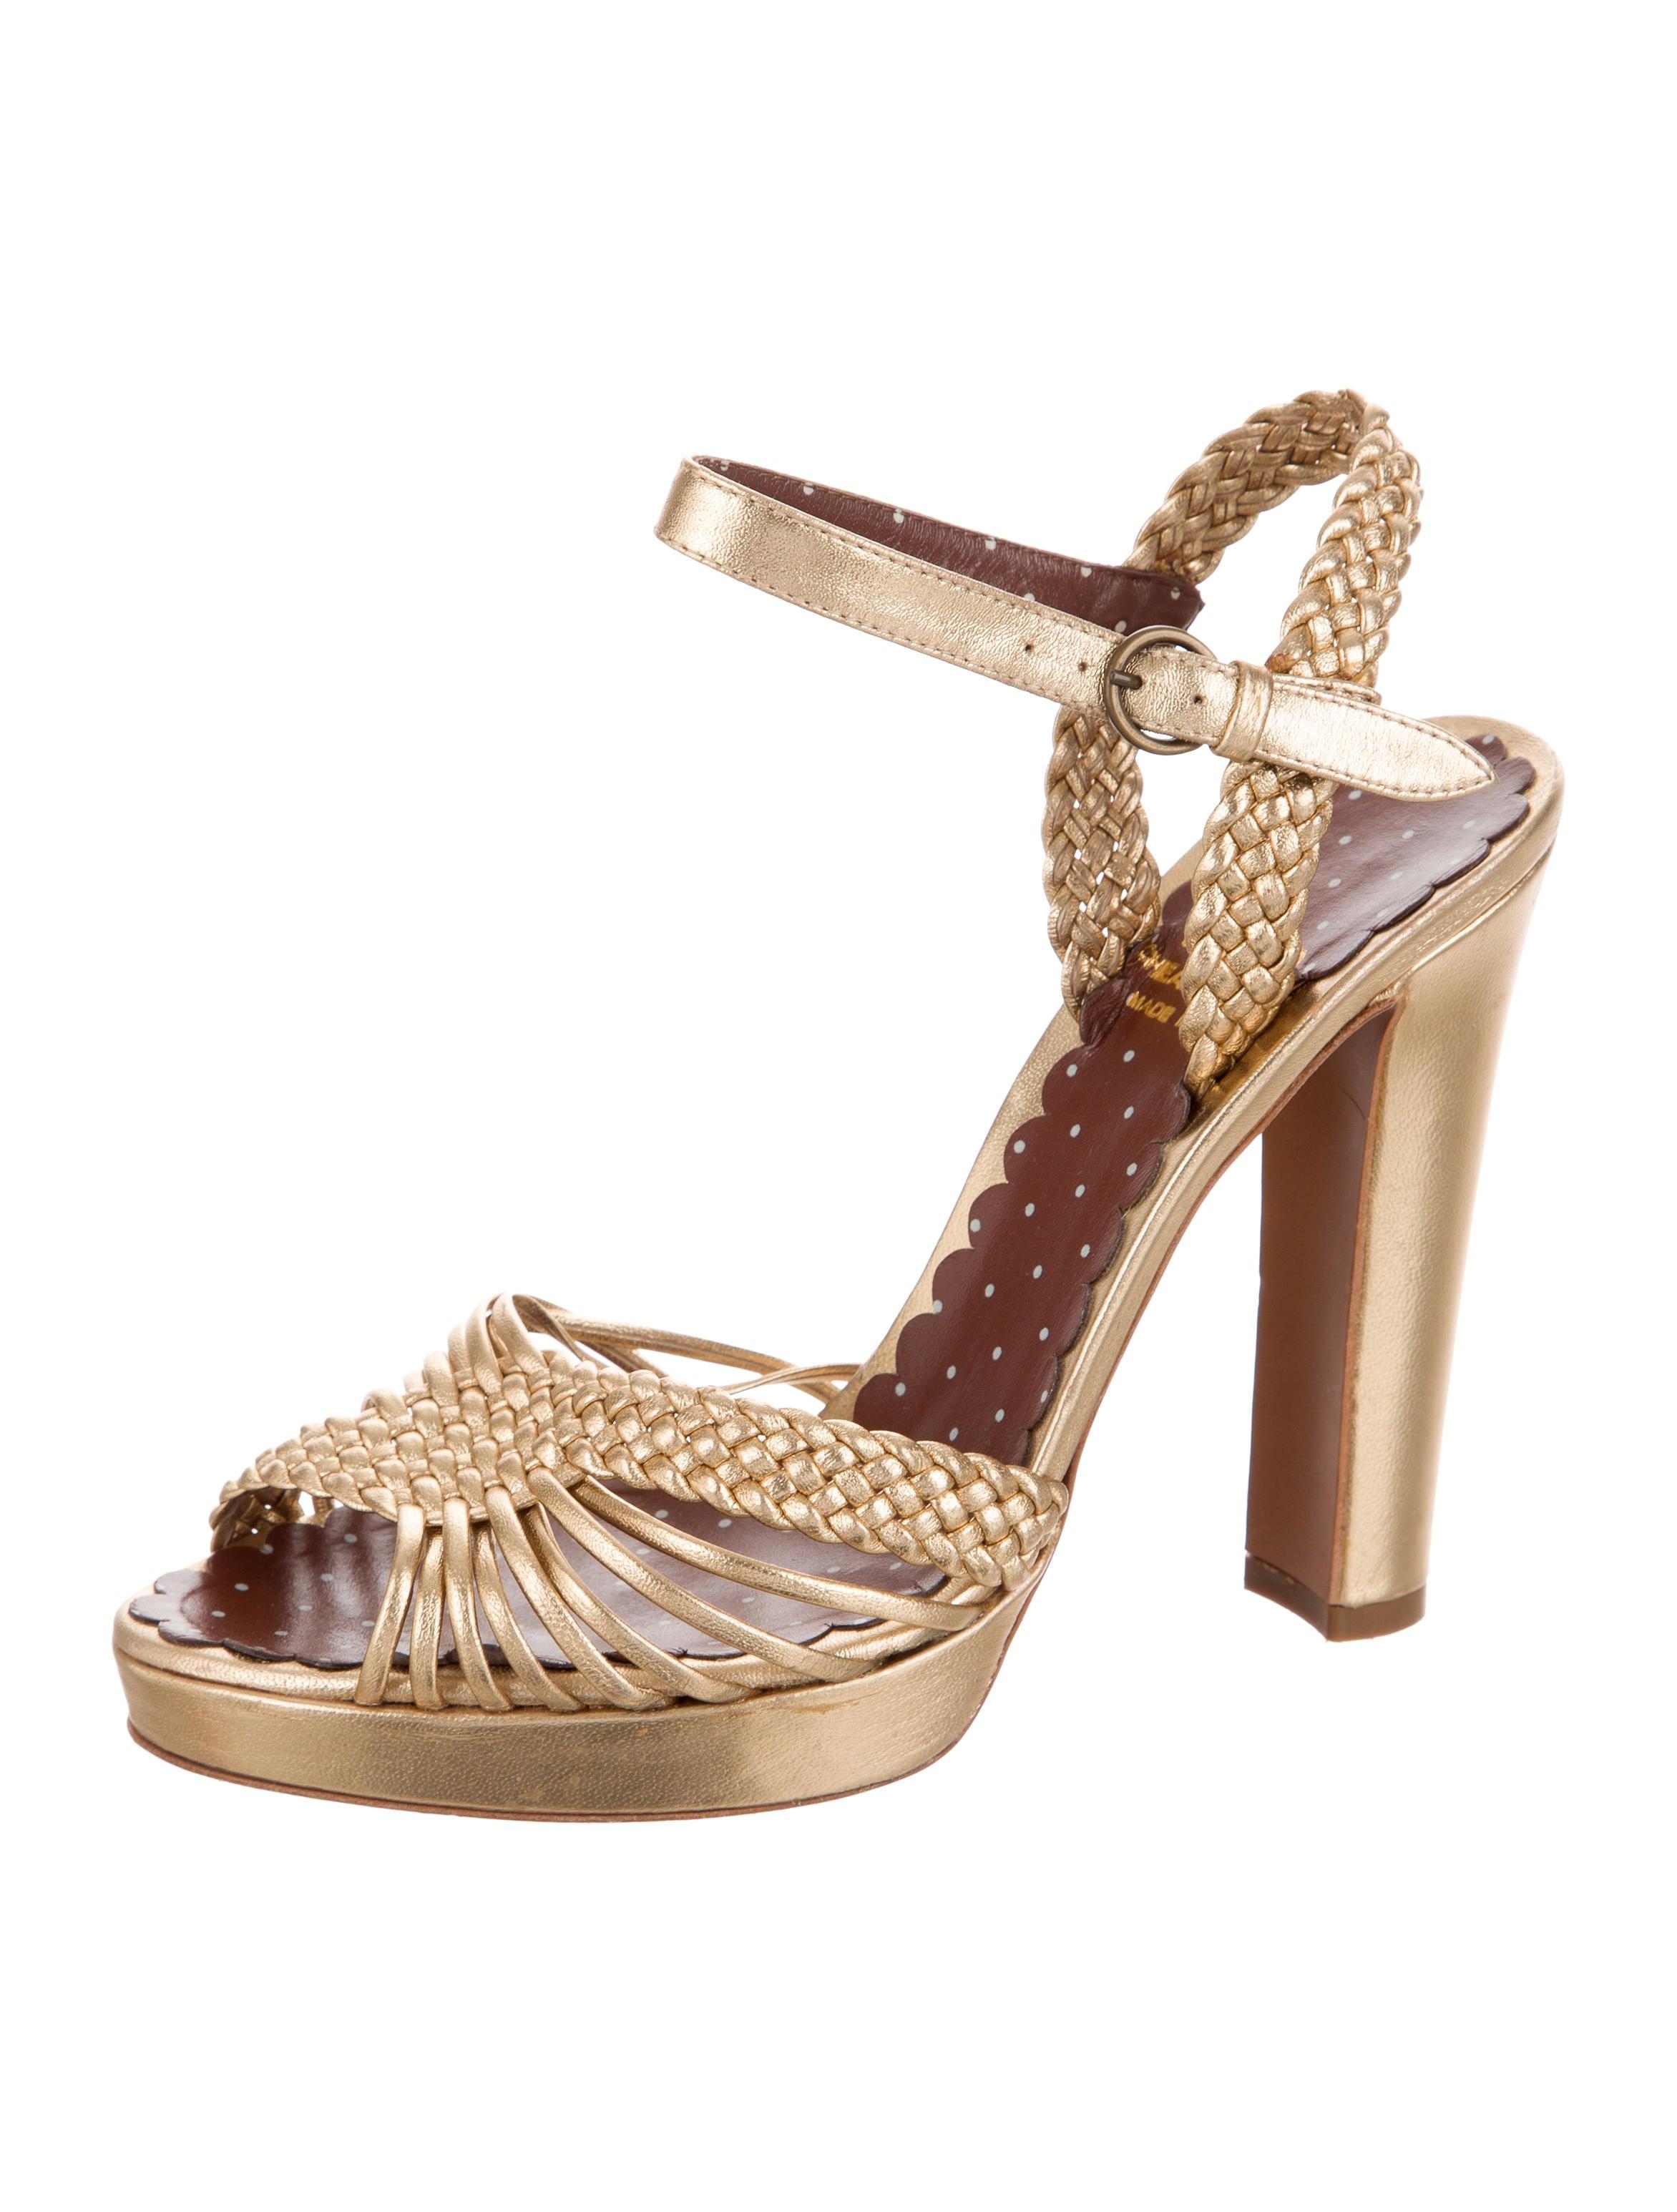 sale popular Moschino Cheap and Chic Metallic Platform Sandlas free shipping fashion Style store sale online cheap sale outlet footlocker 7cfWArhLep